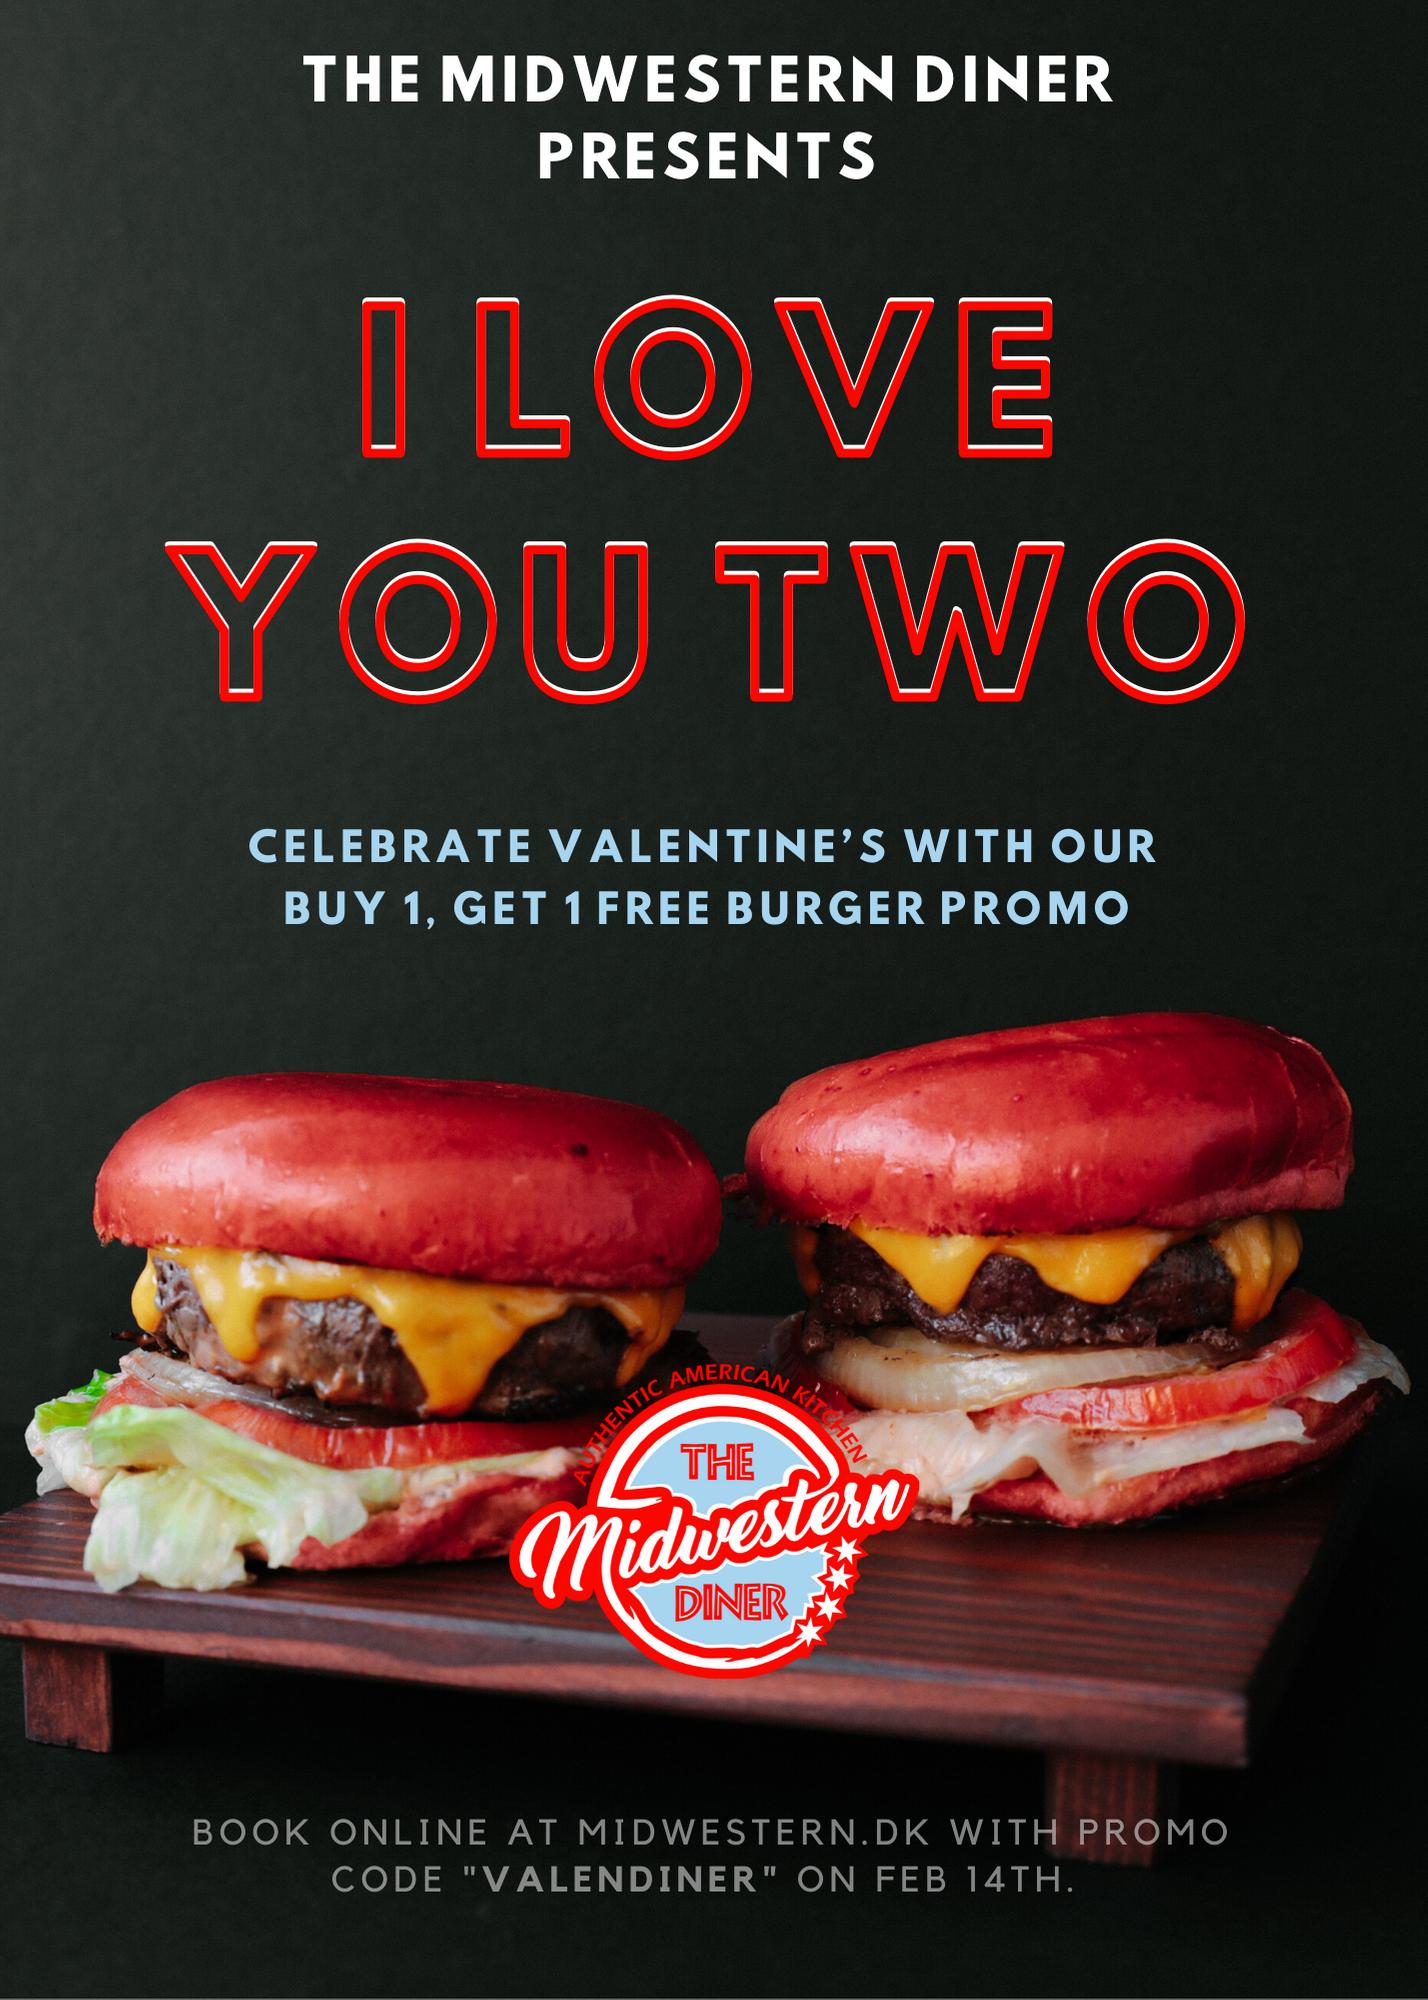 Valentine's tilbud info